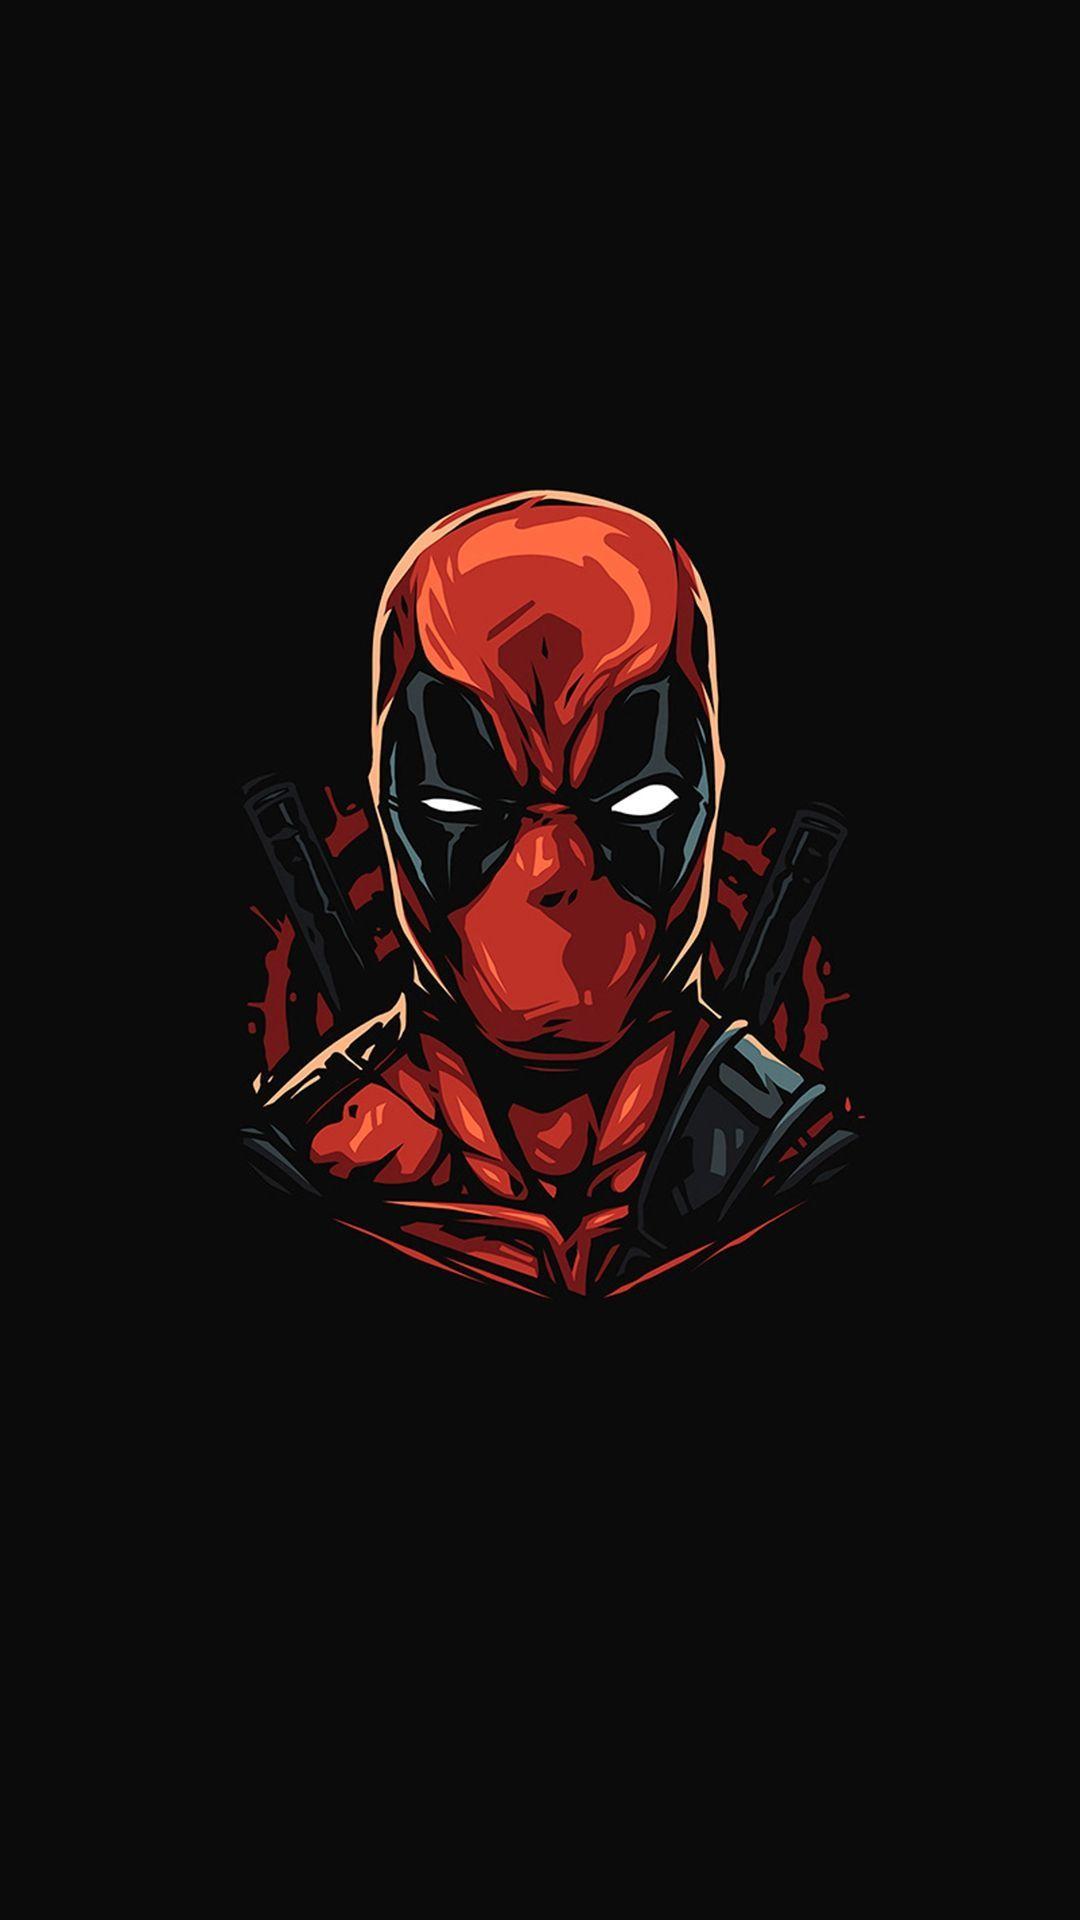 Comic Deadpool Iphone Wallpaper Ipcwallpapers In 2020 Marvel Comics Wallpaper Deadpool Wallpaper Deadpool Wallpaper Iphone